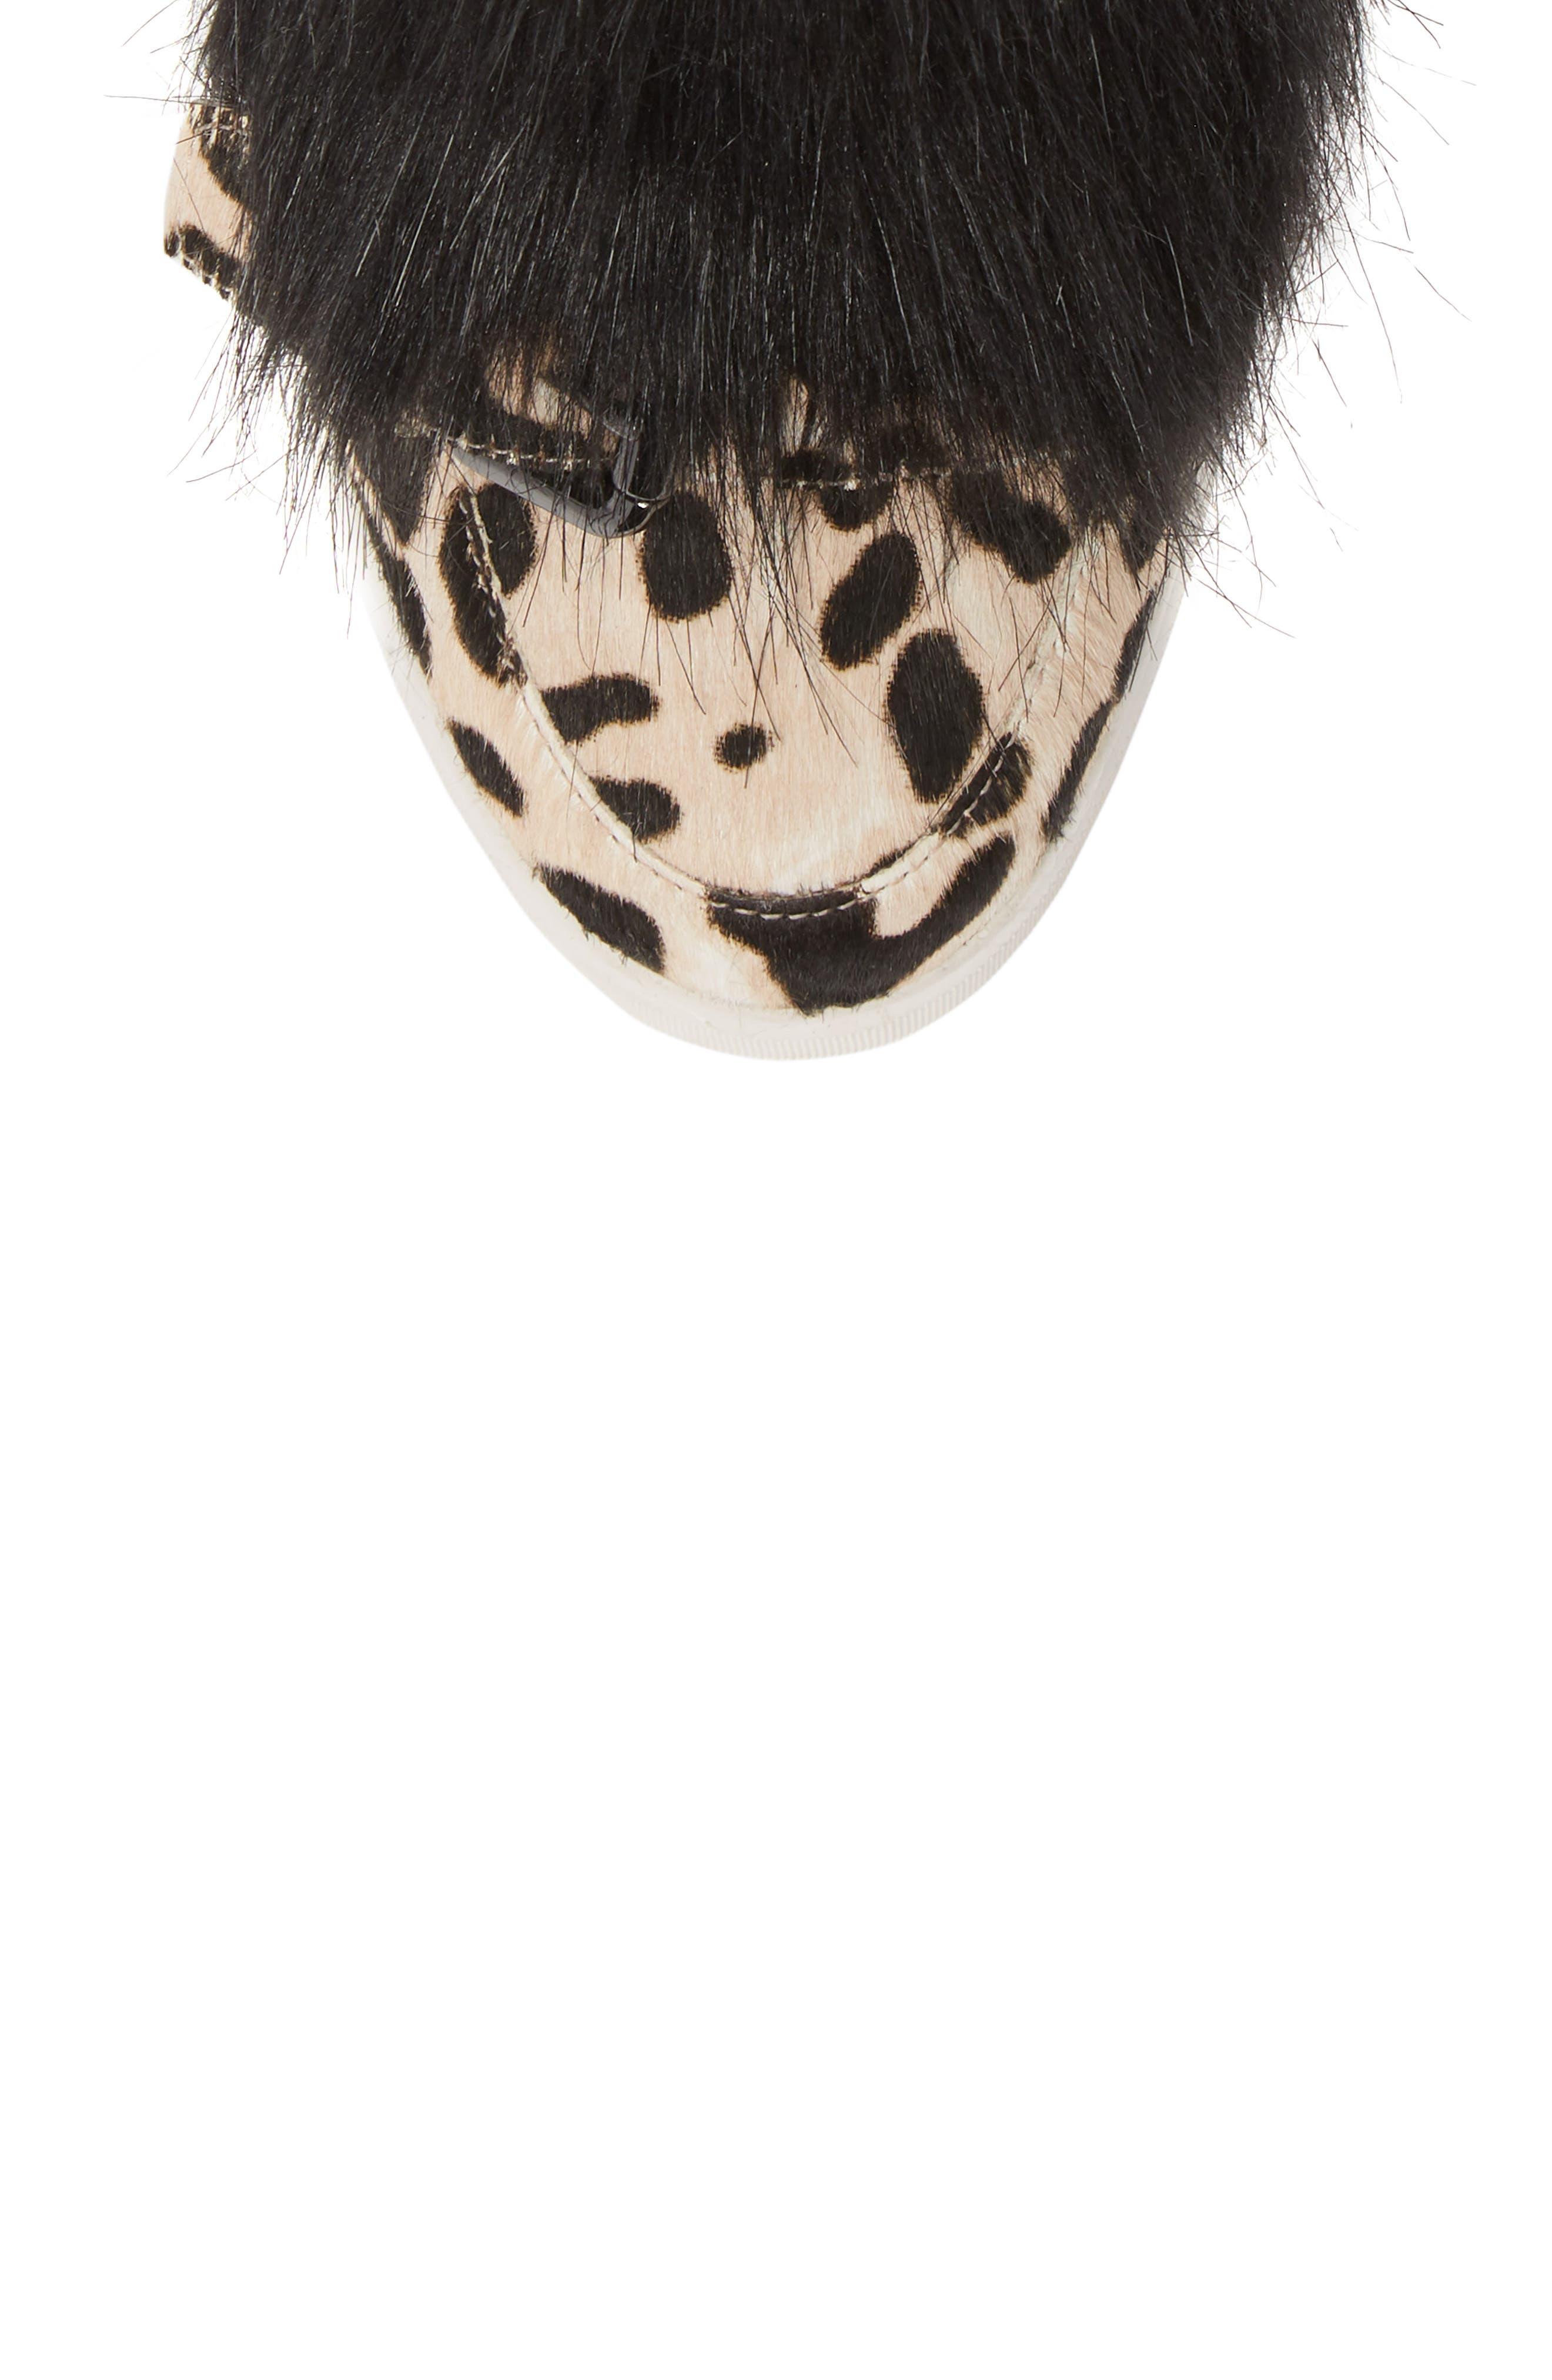 LINEA PAOLO, Fifi 2 Wedge Sneaker, Alternate thumbnail 5, color, WHITE/ BLACK LEOPARD HAIRCALF